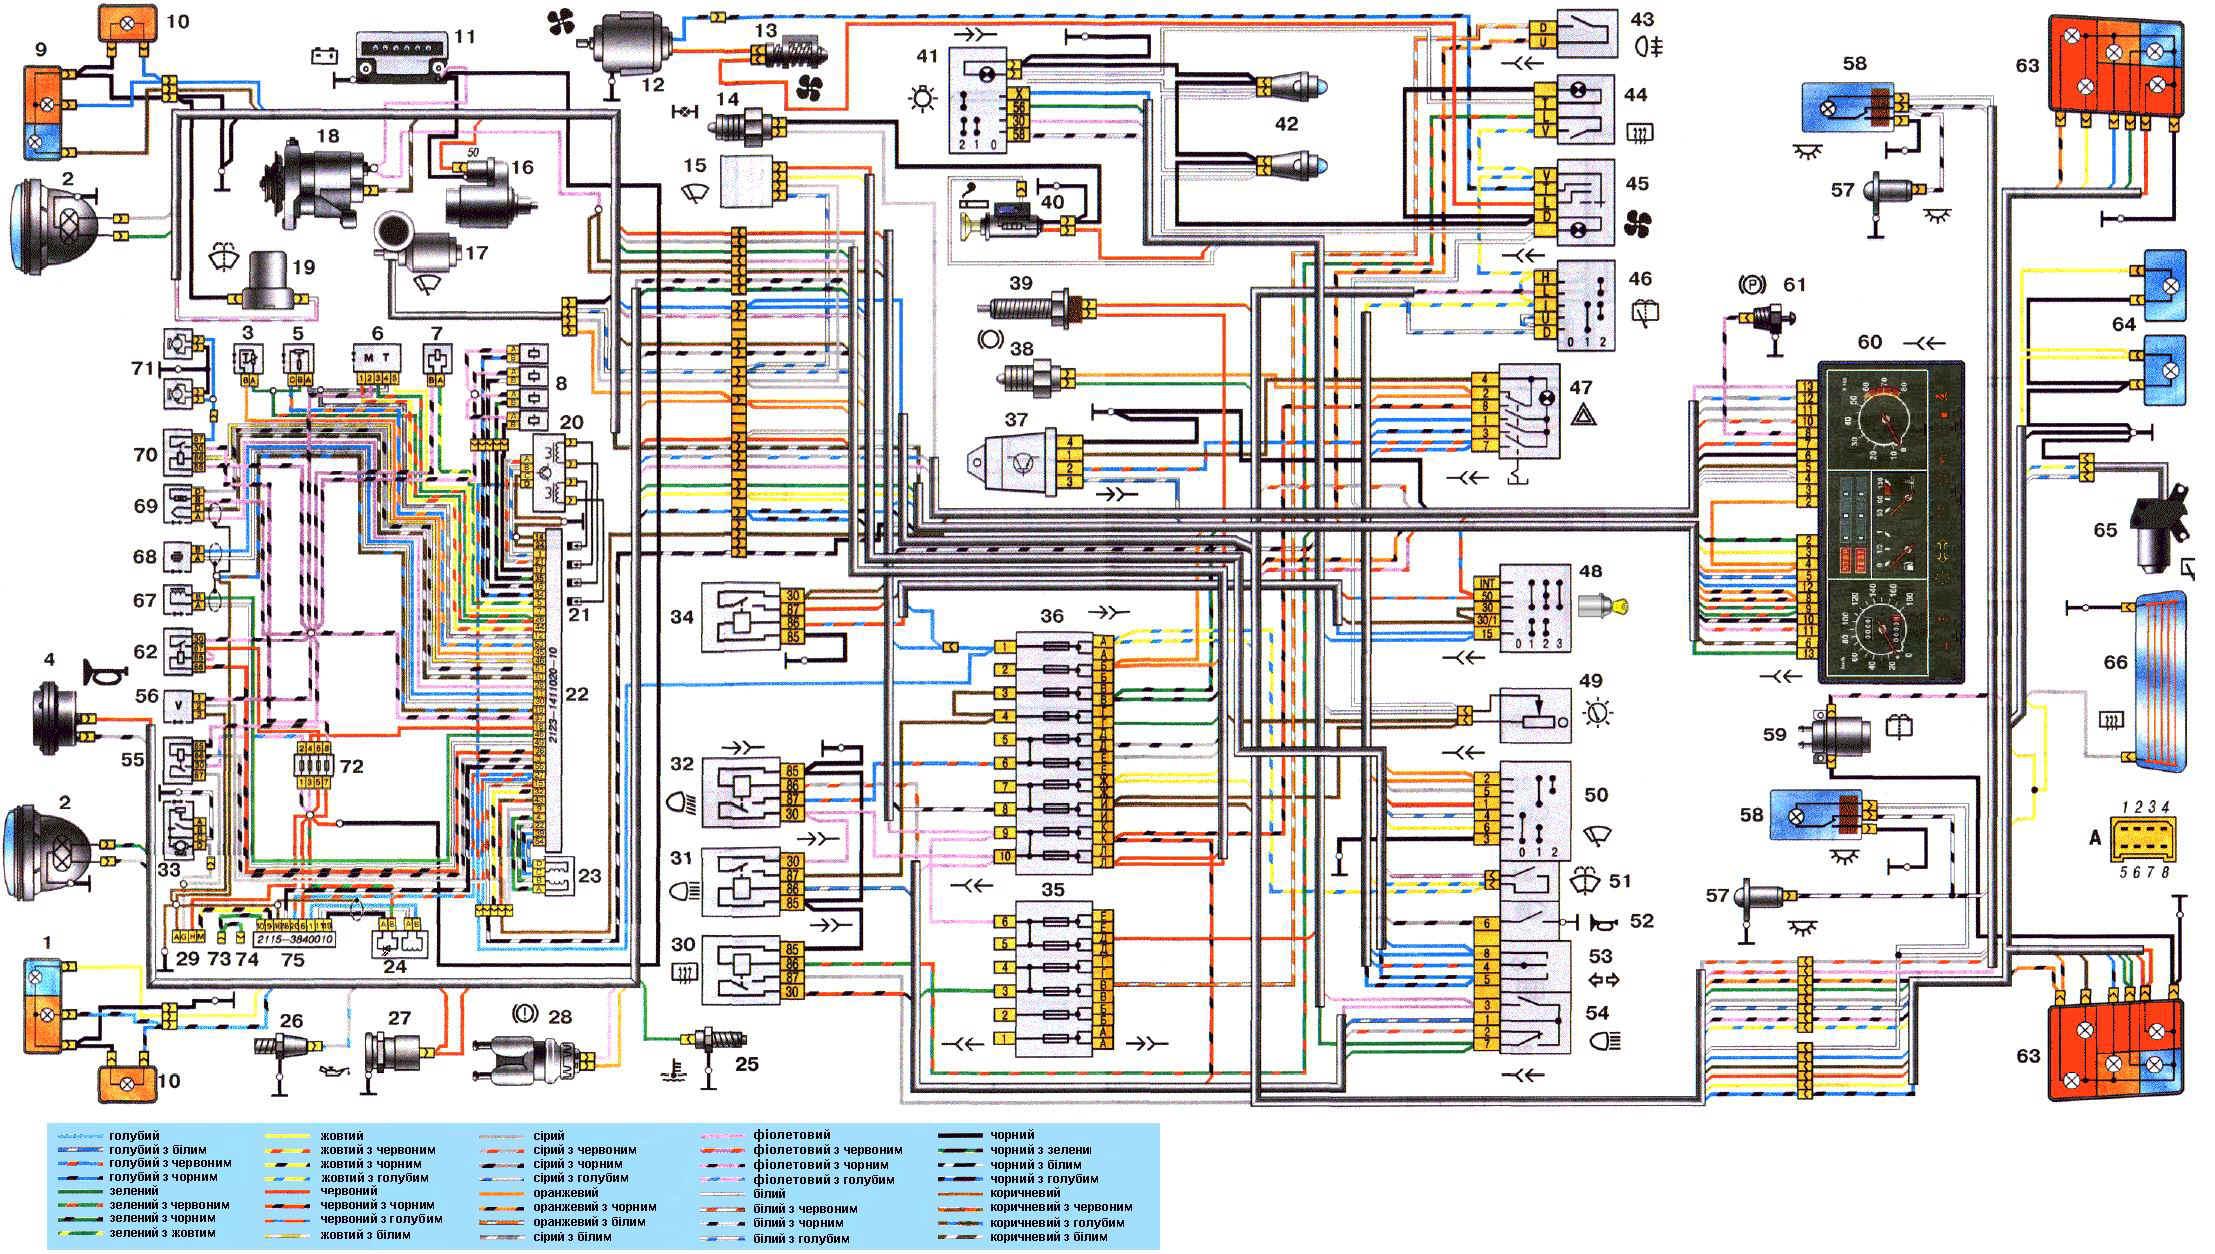 Схема электрооборудования автомобиля ВАЗ 21214.